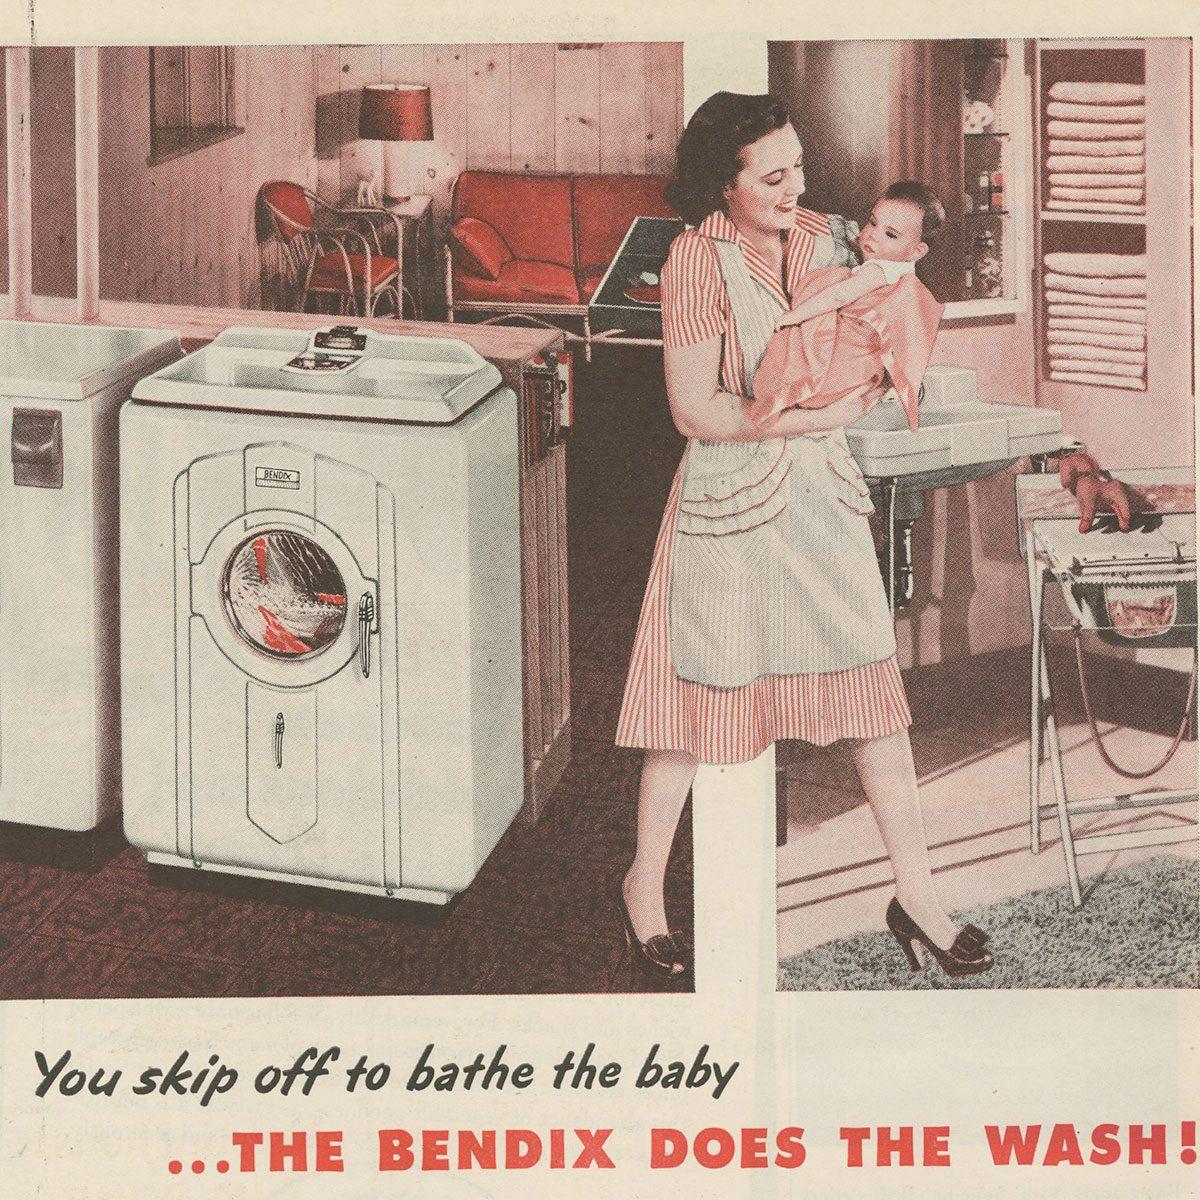 Bendix Washing Machine ad